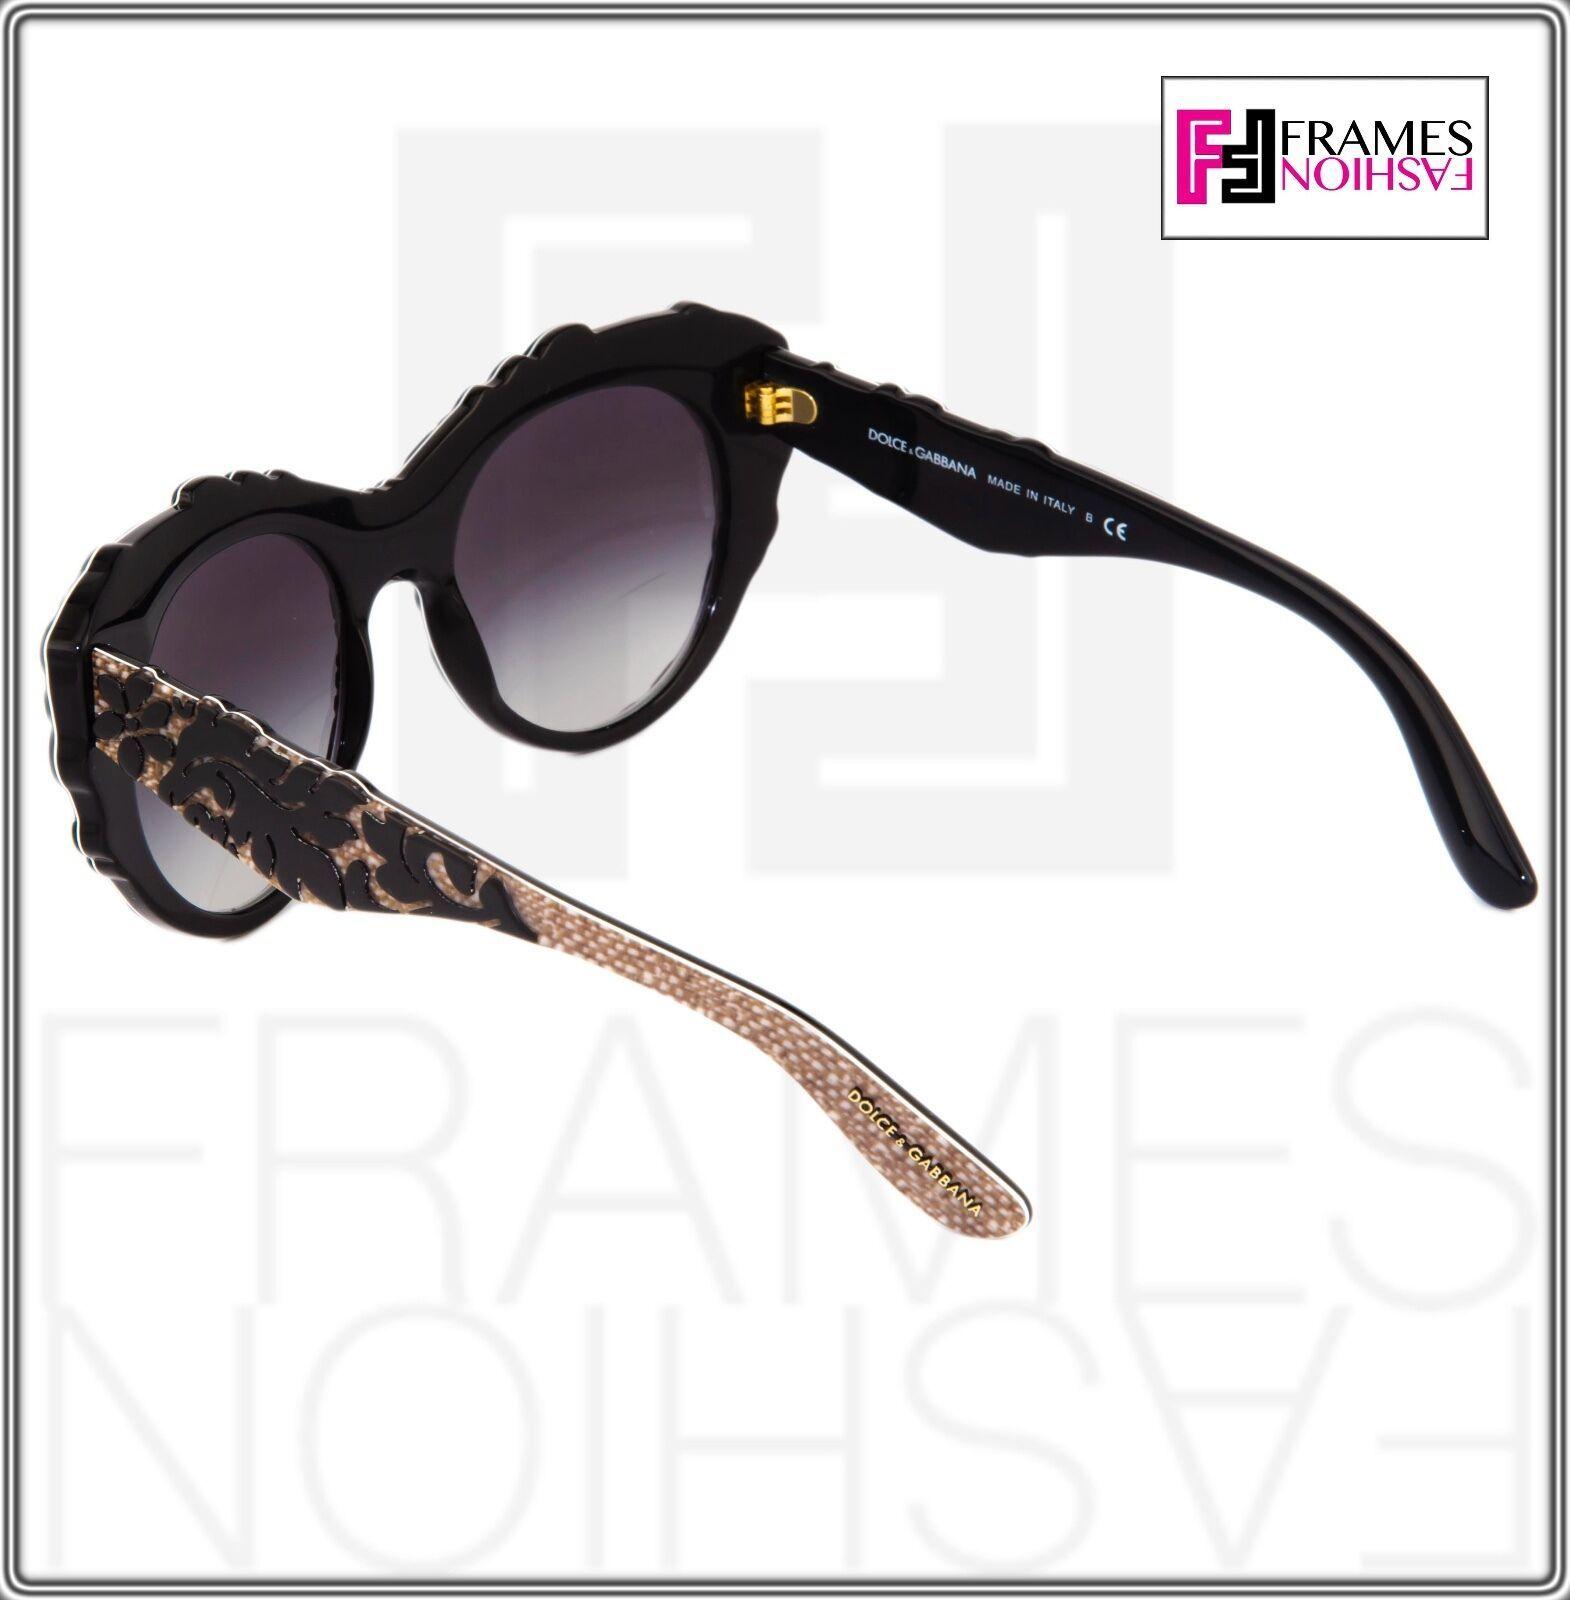 Dolce & Gabbana Mamas Brocade Black Texture Gradient Cat Eye Sunglasses 4267